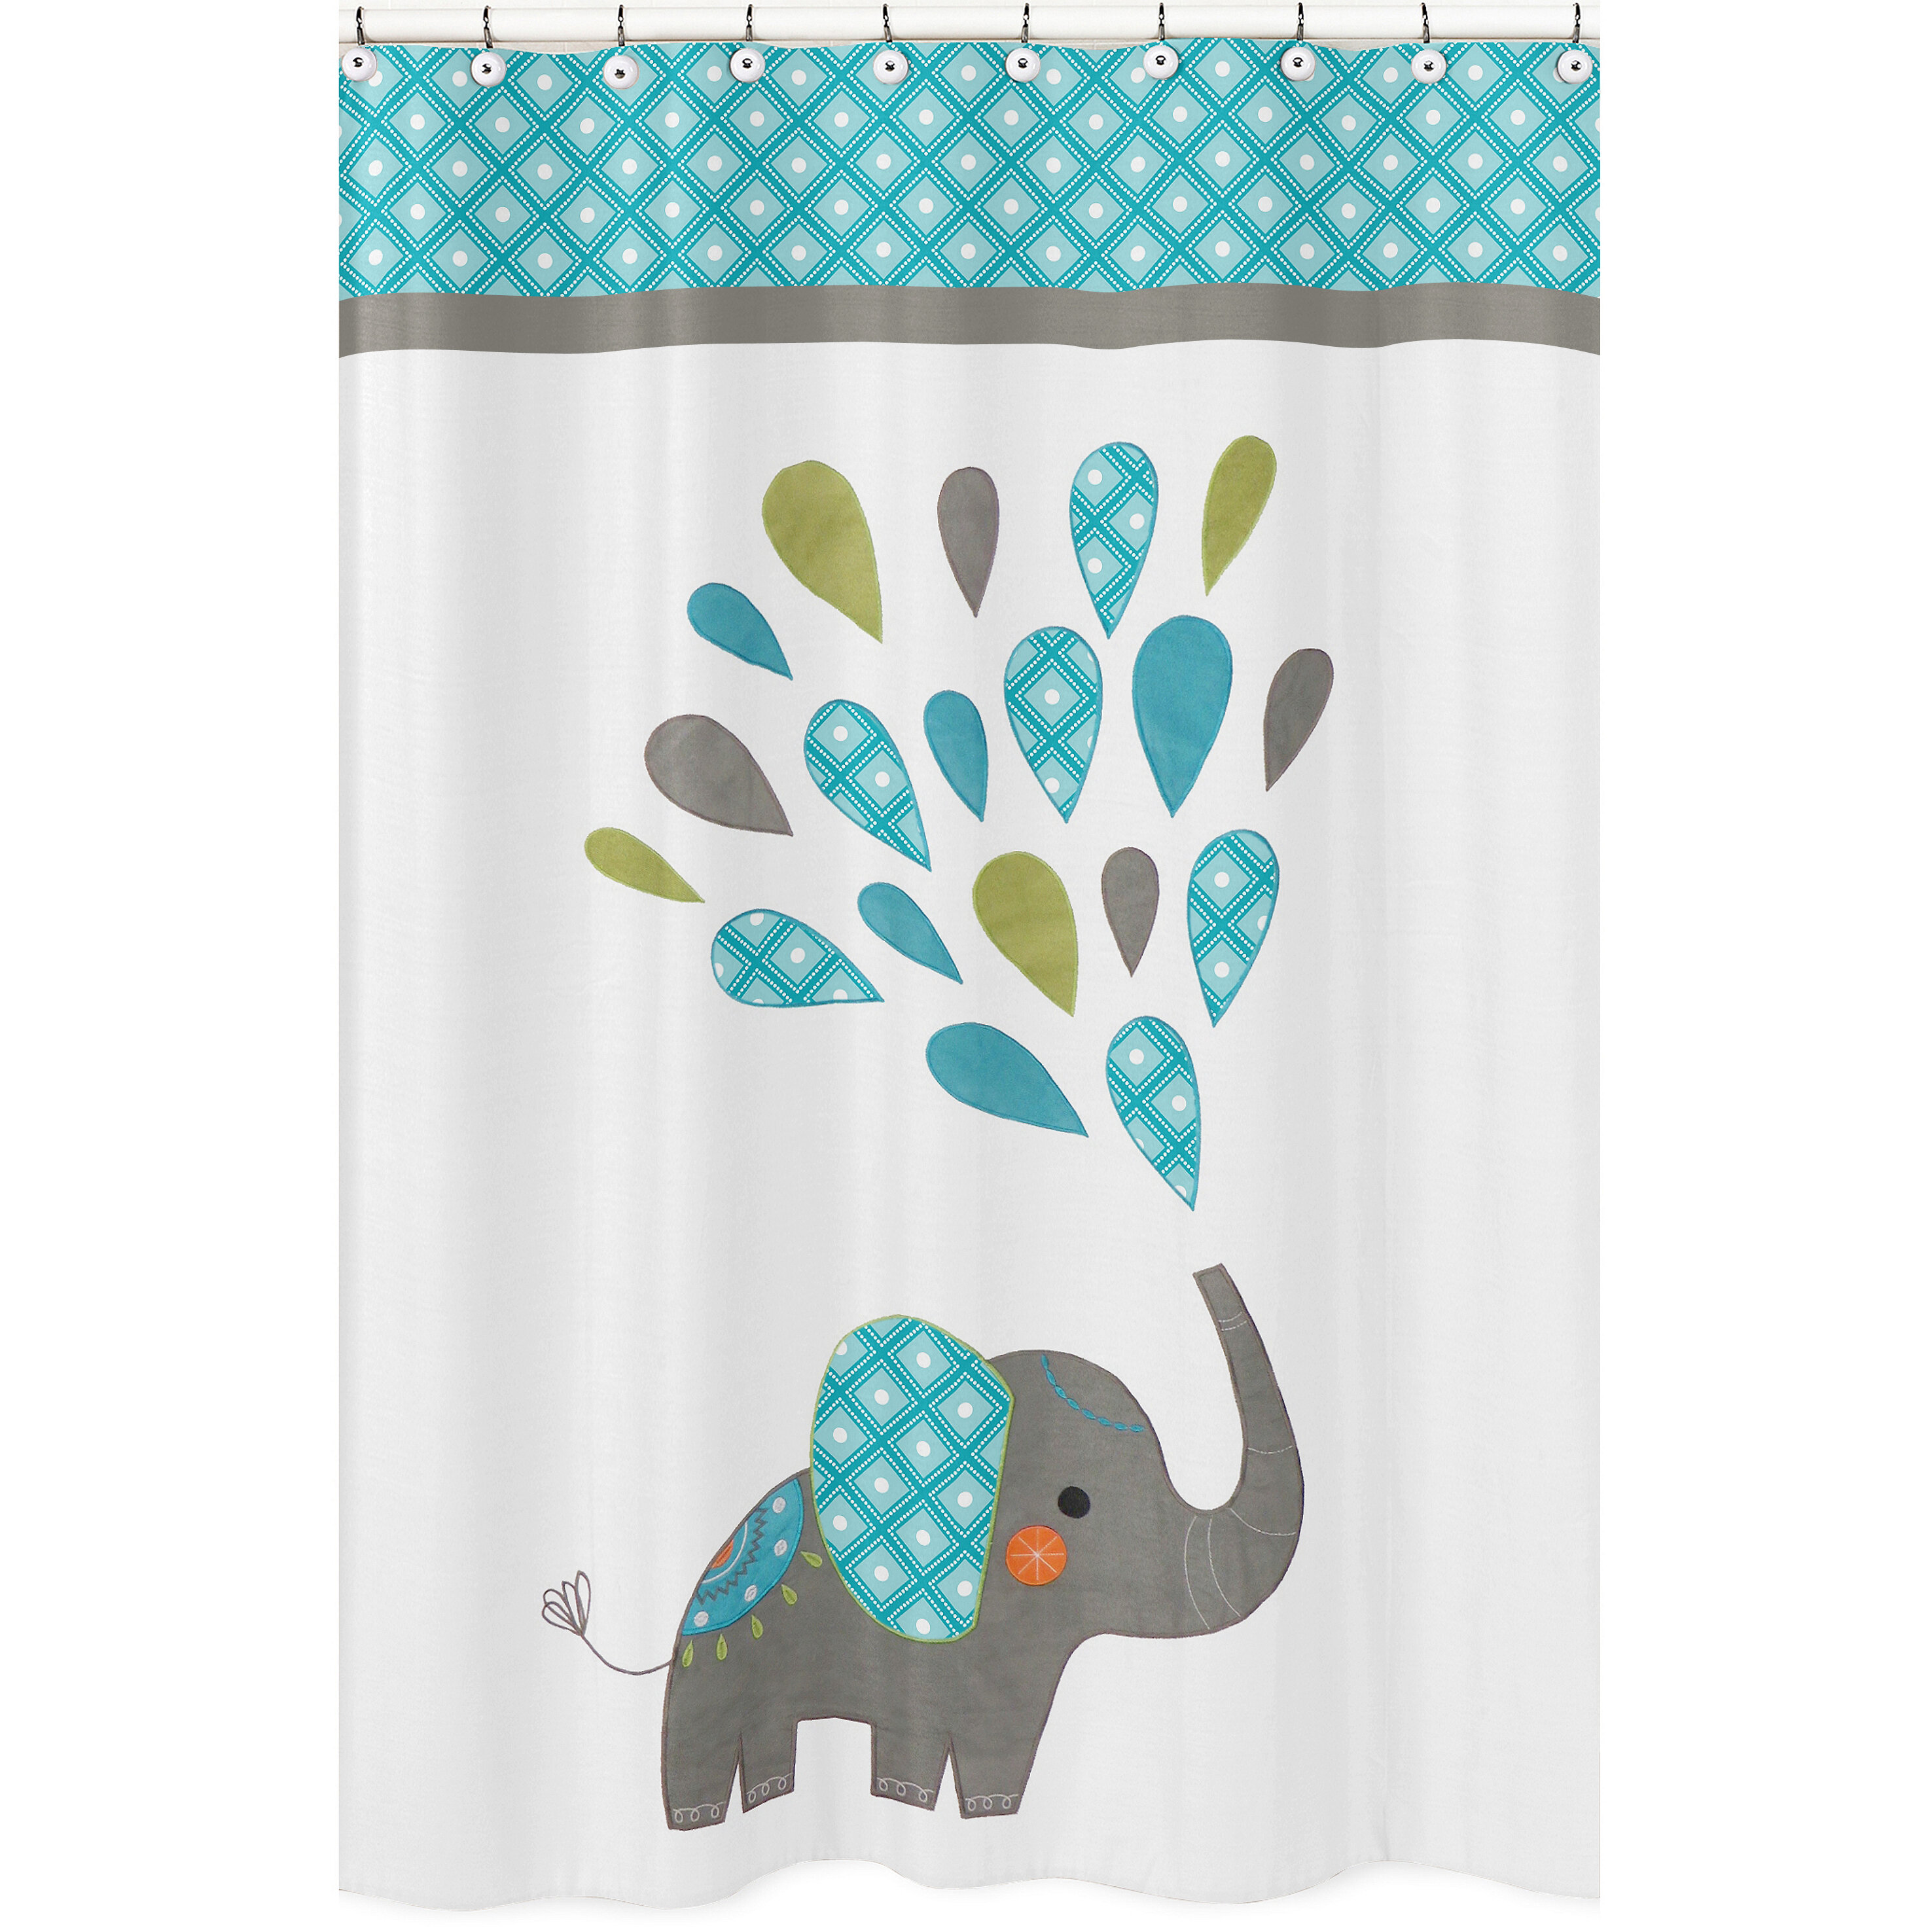 Sweet Jojo Designs Mod Elephant Shower Curtain Reviews